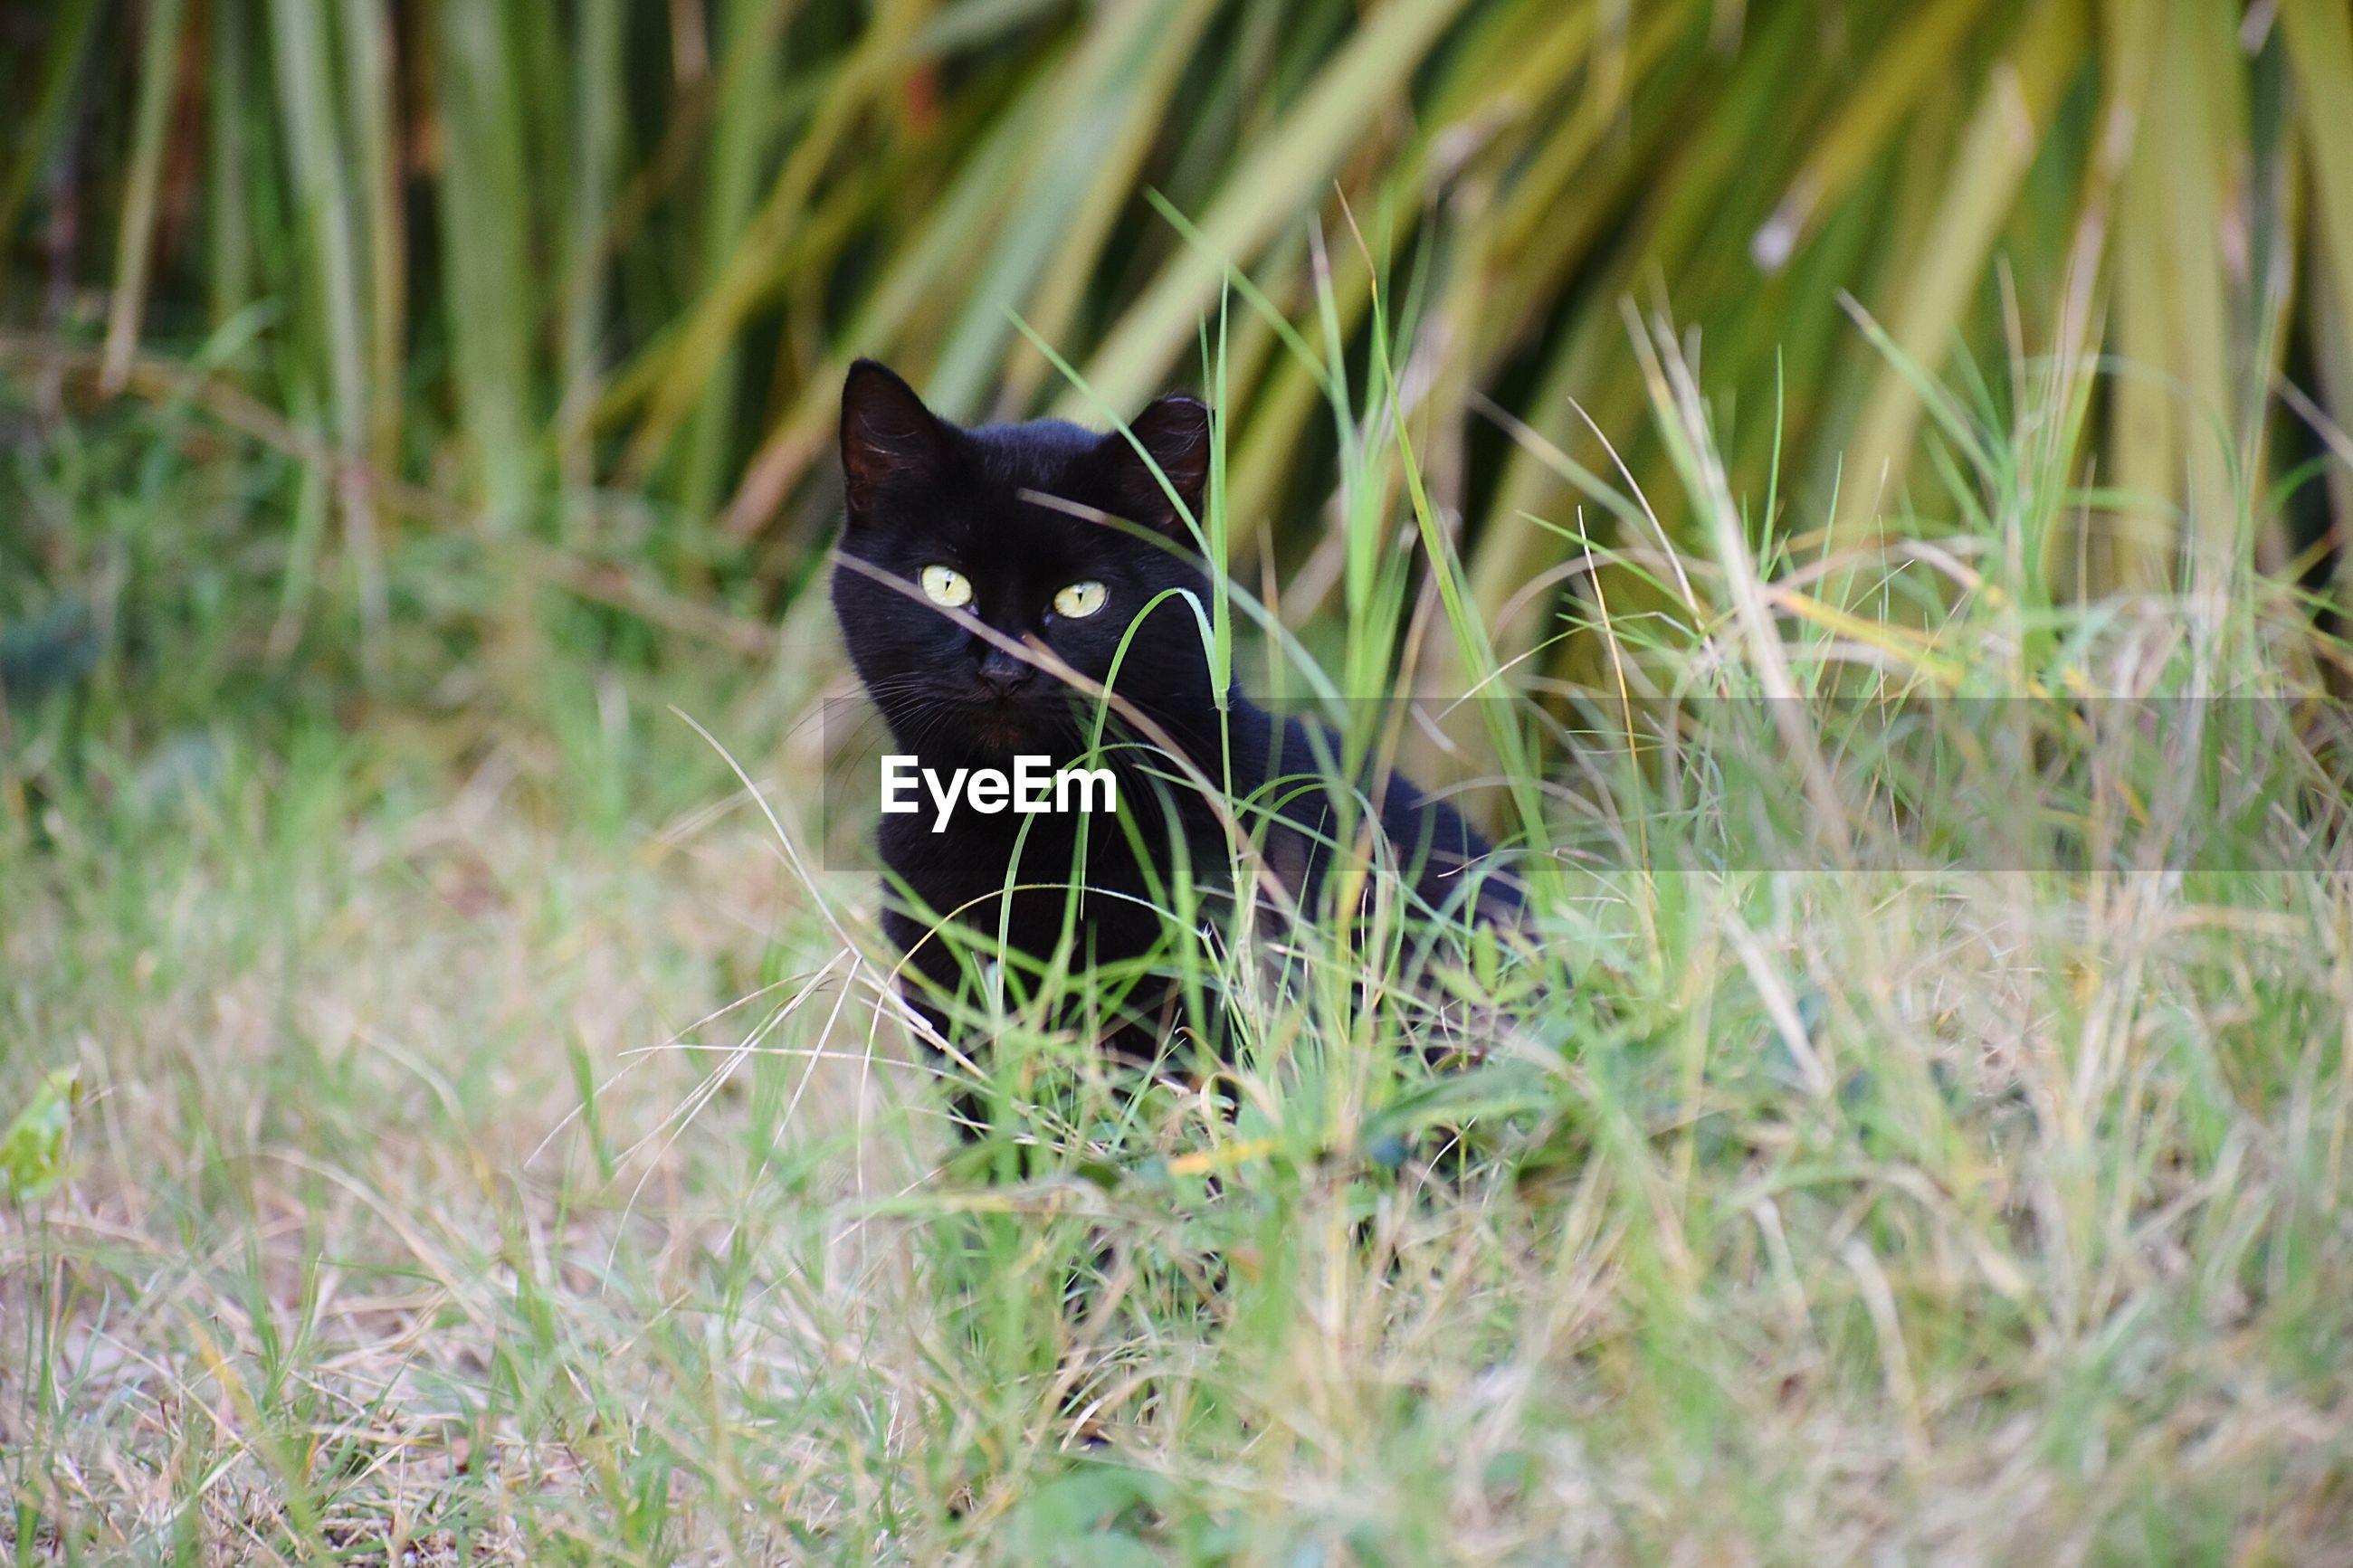 CAT ON GRASS FIELD